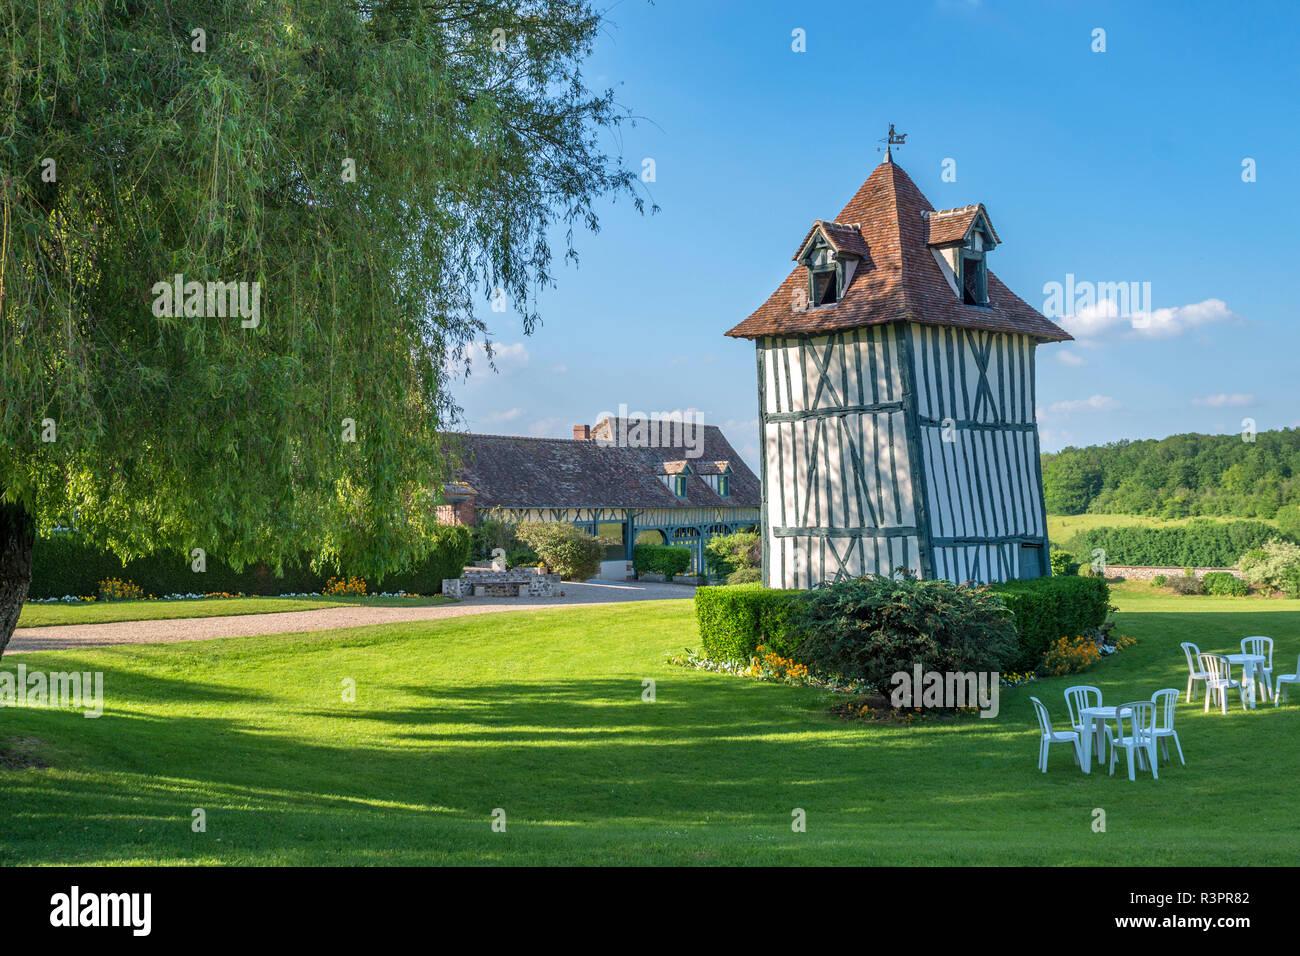 Commanderie de Templiers, Vexin region, France - Stock Image